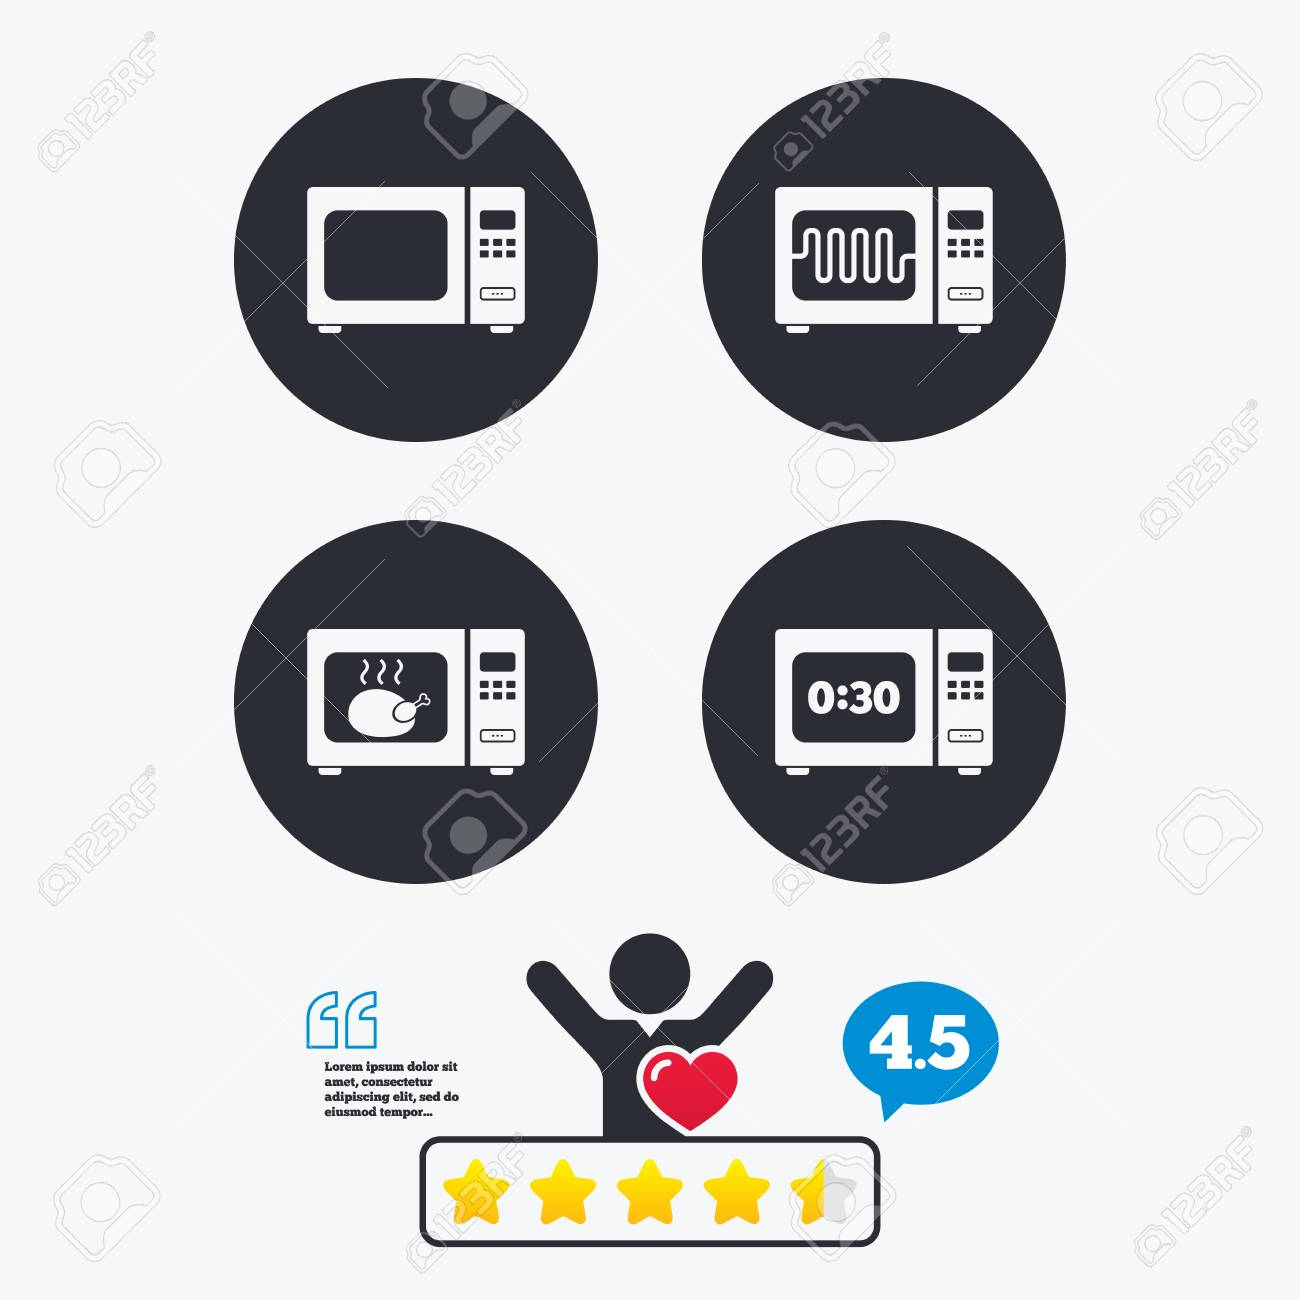 Tolle Timer Elektrisches Symbol Fotos - Verdrahtungsideen - korsmi.info